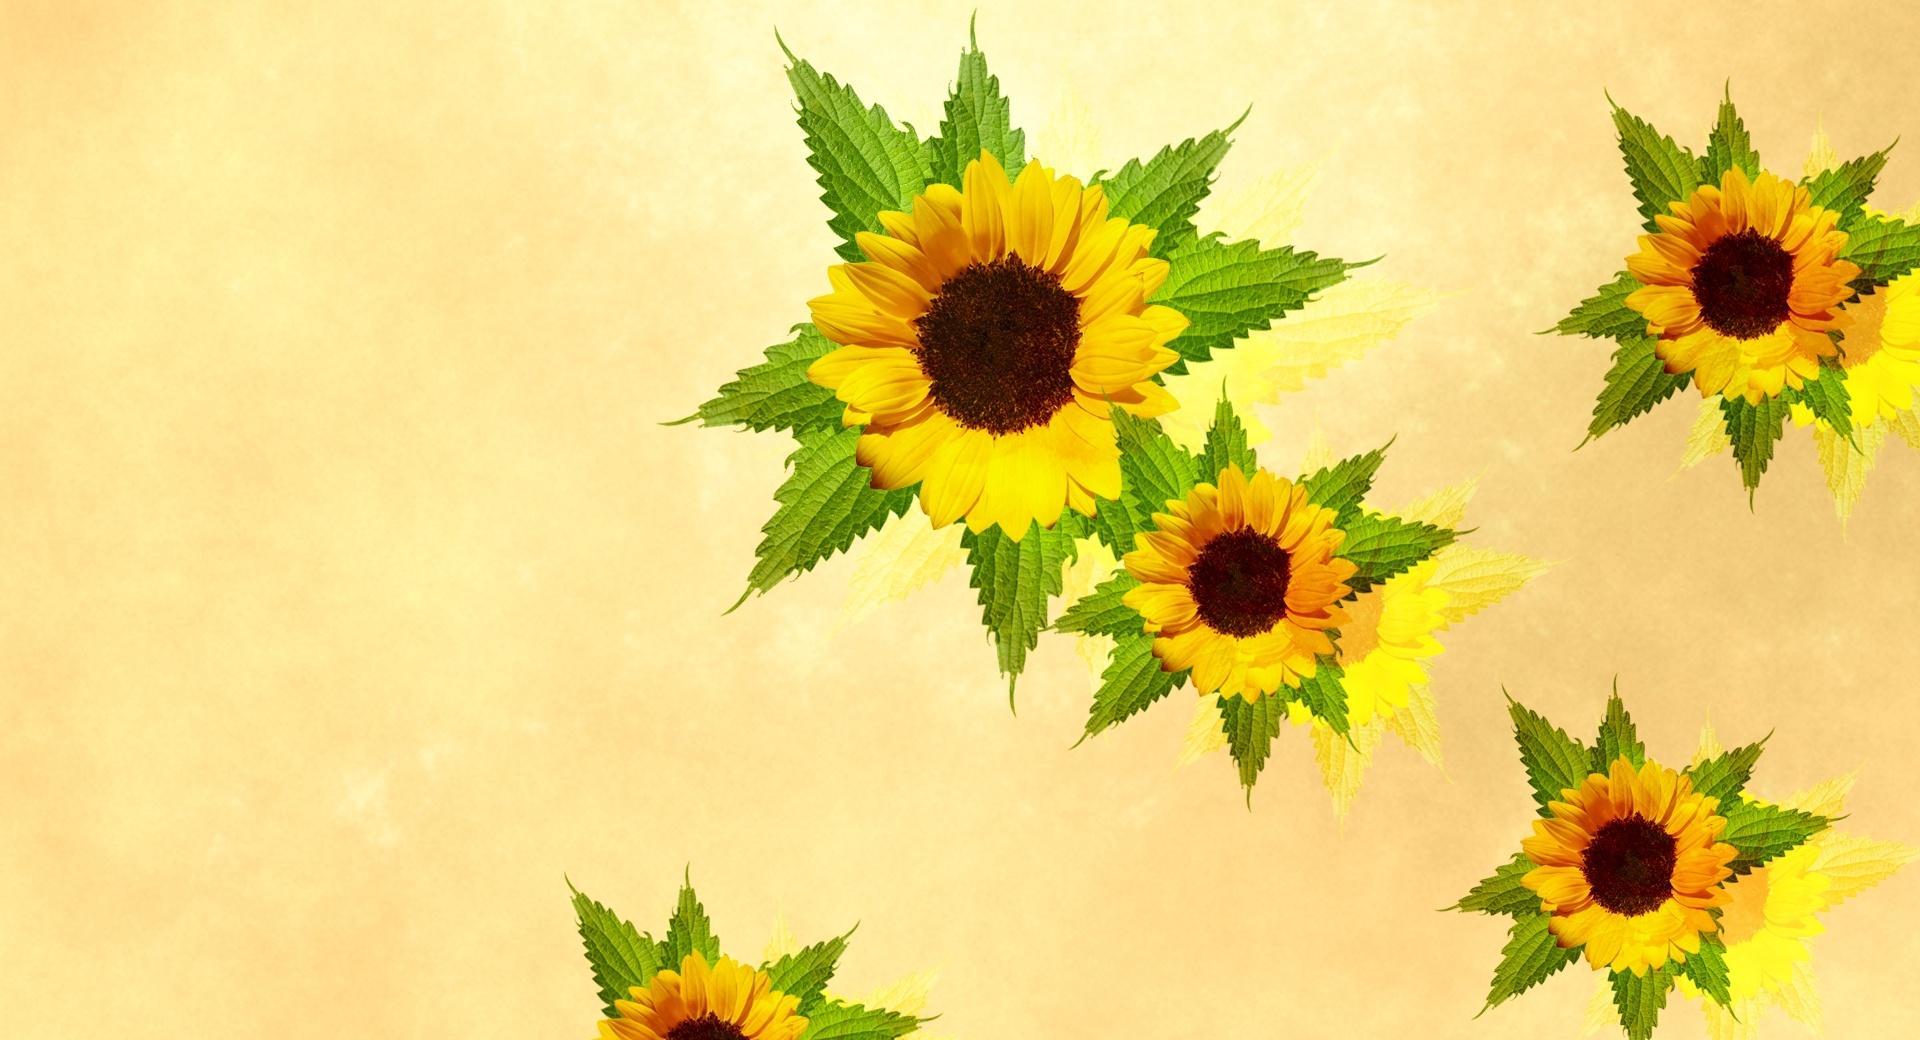 Desktop Sunflowers wallpapers HD quality